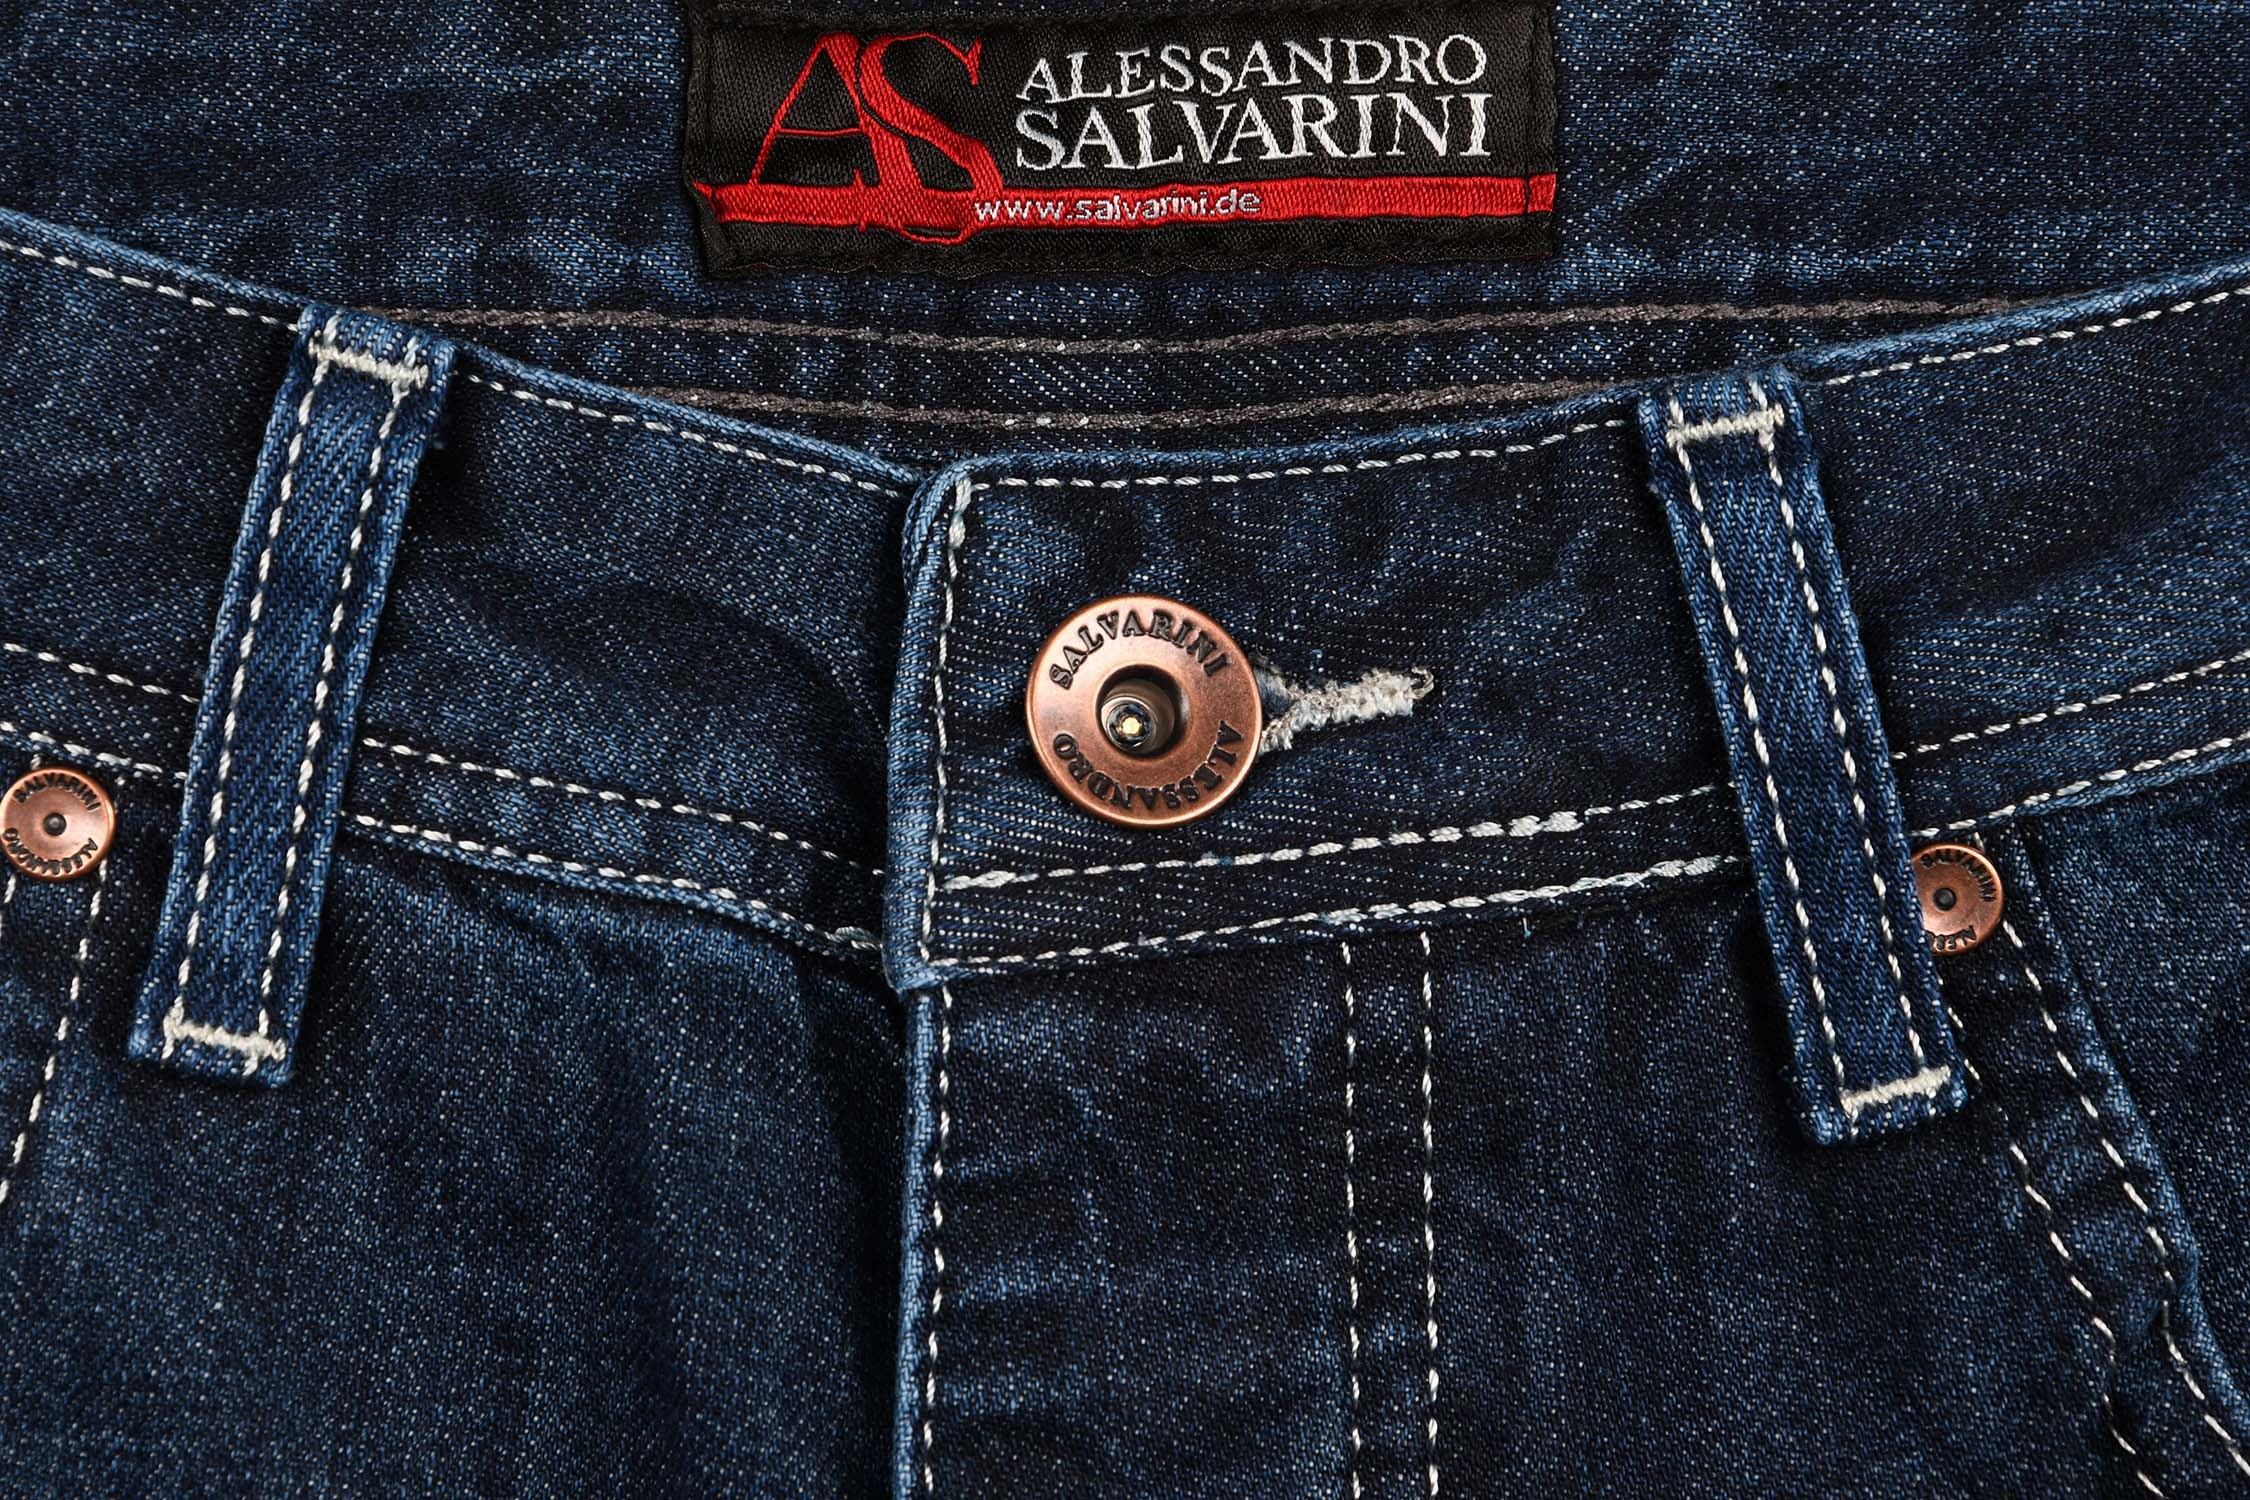 A-Salvarini-Designer-Herren-Jeans-Short-kurze-Sommer-Hose-Jeansshorts-Bermuda Indexbild 21